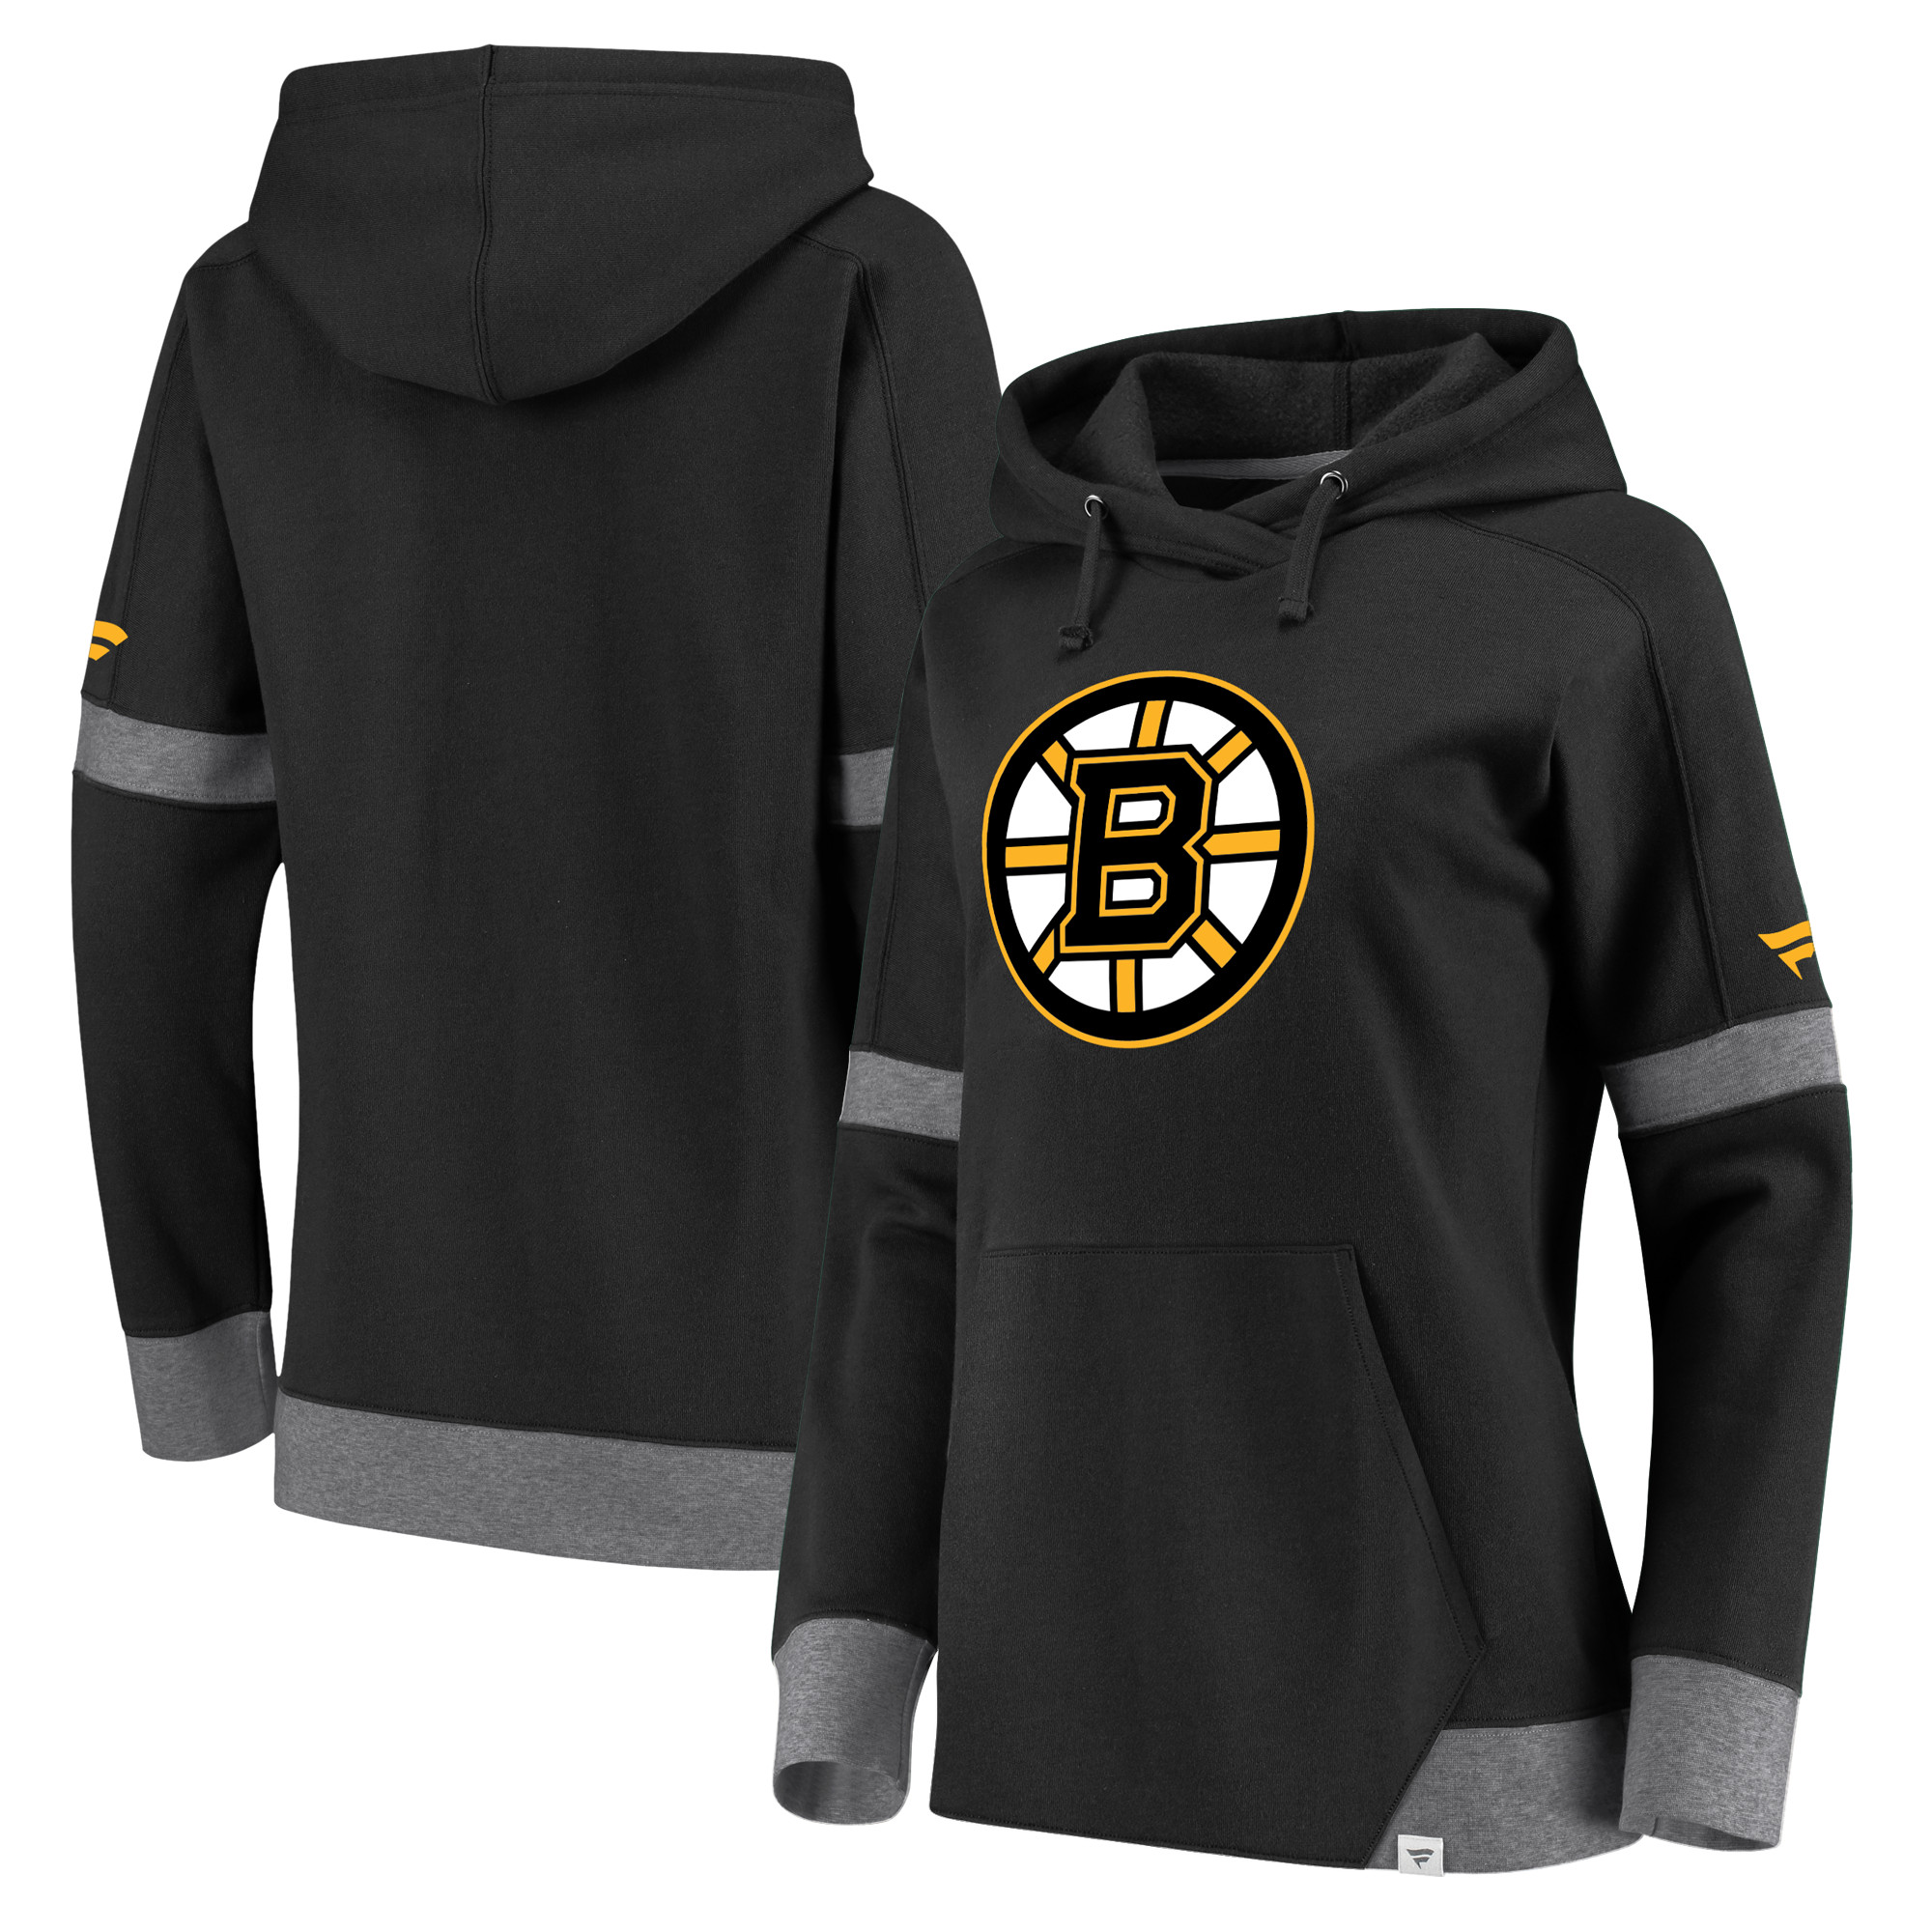 Boston Bruins Fanatics Branded Women's Iconic Pullover Hoodie - Black/Heathered Gray